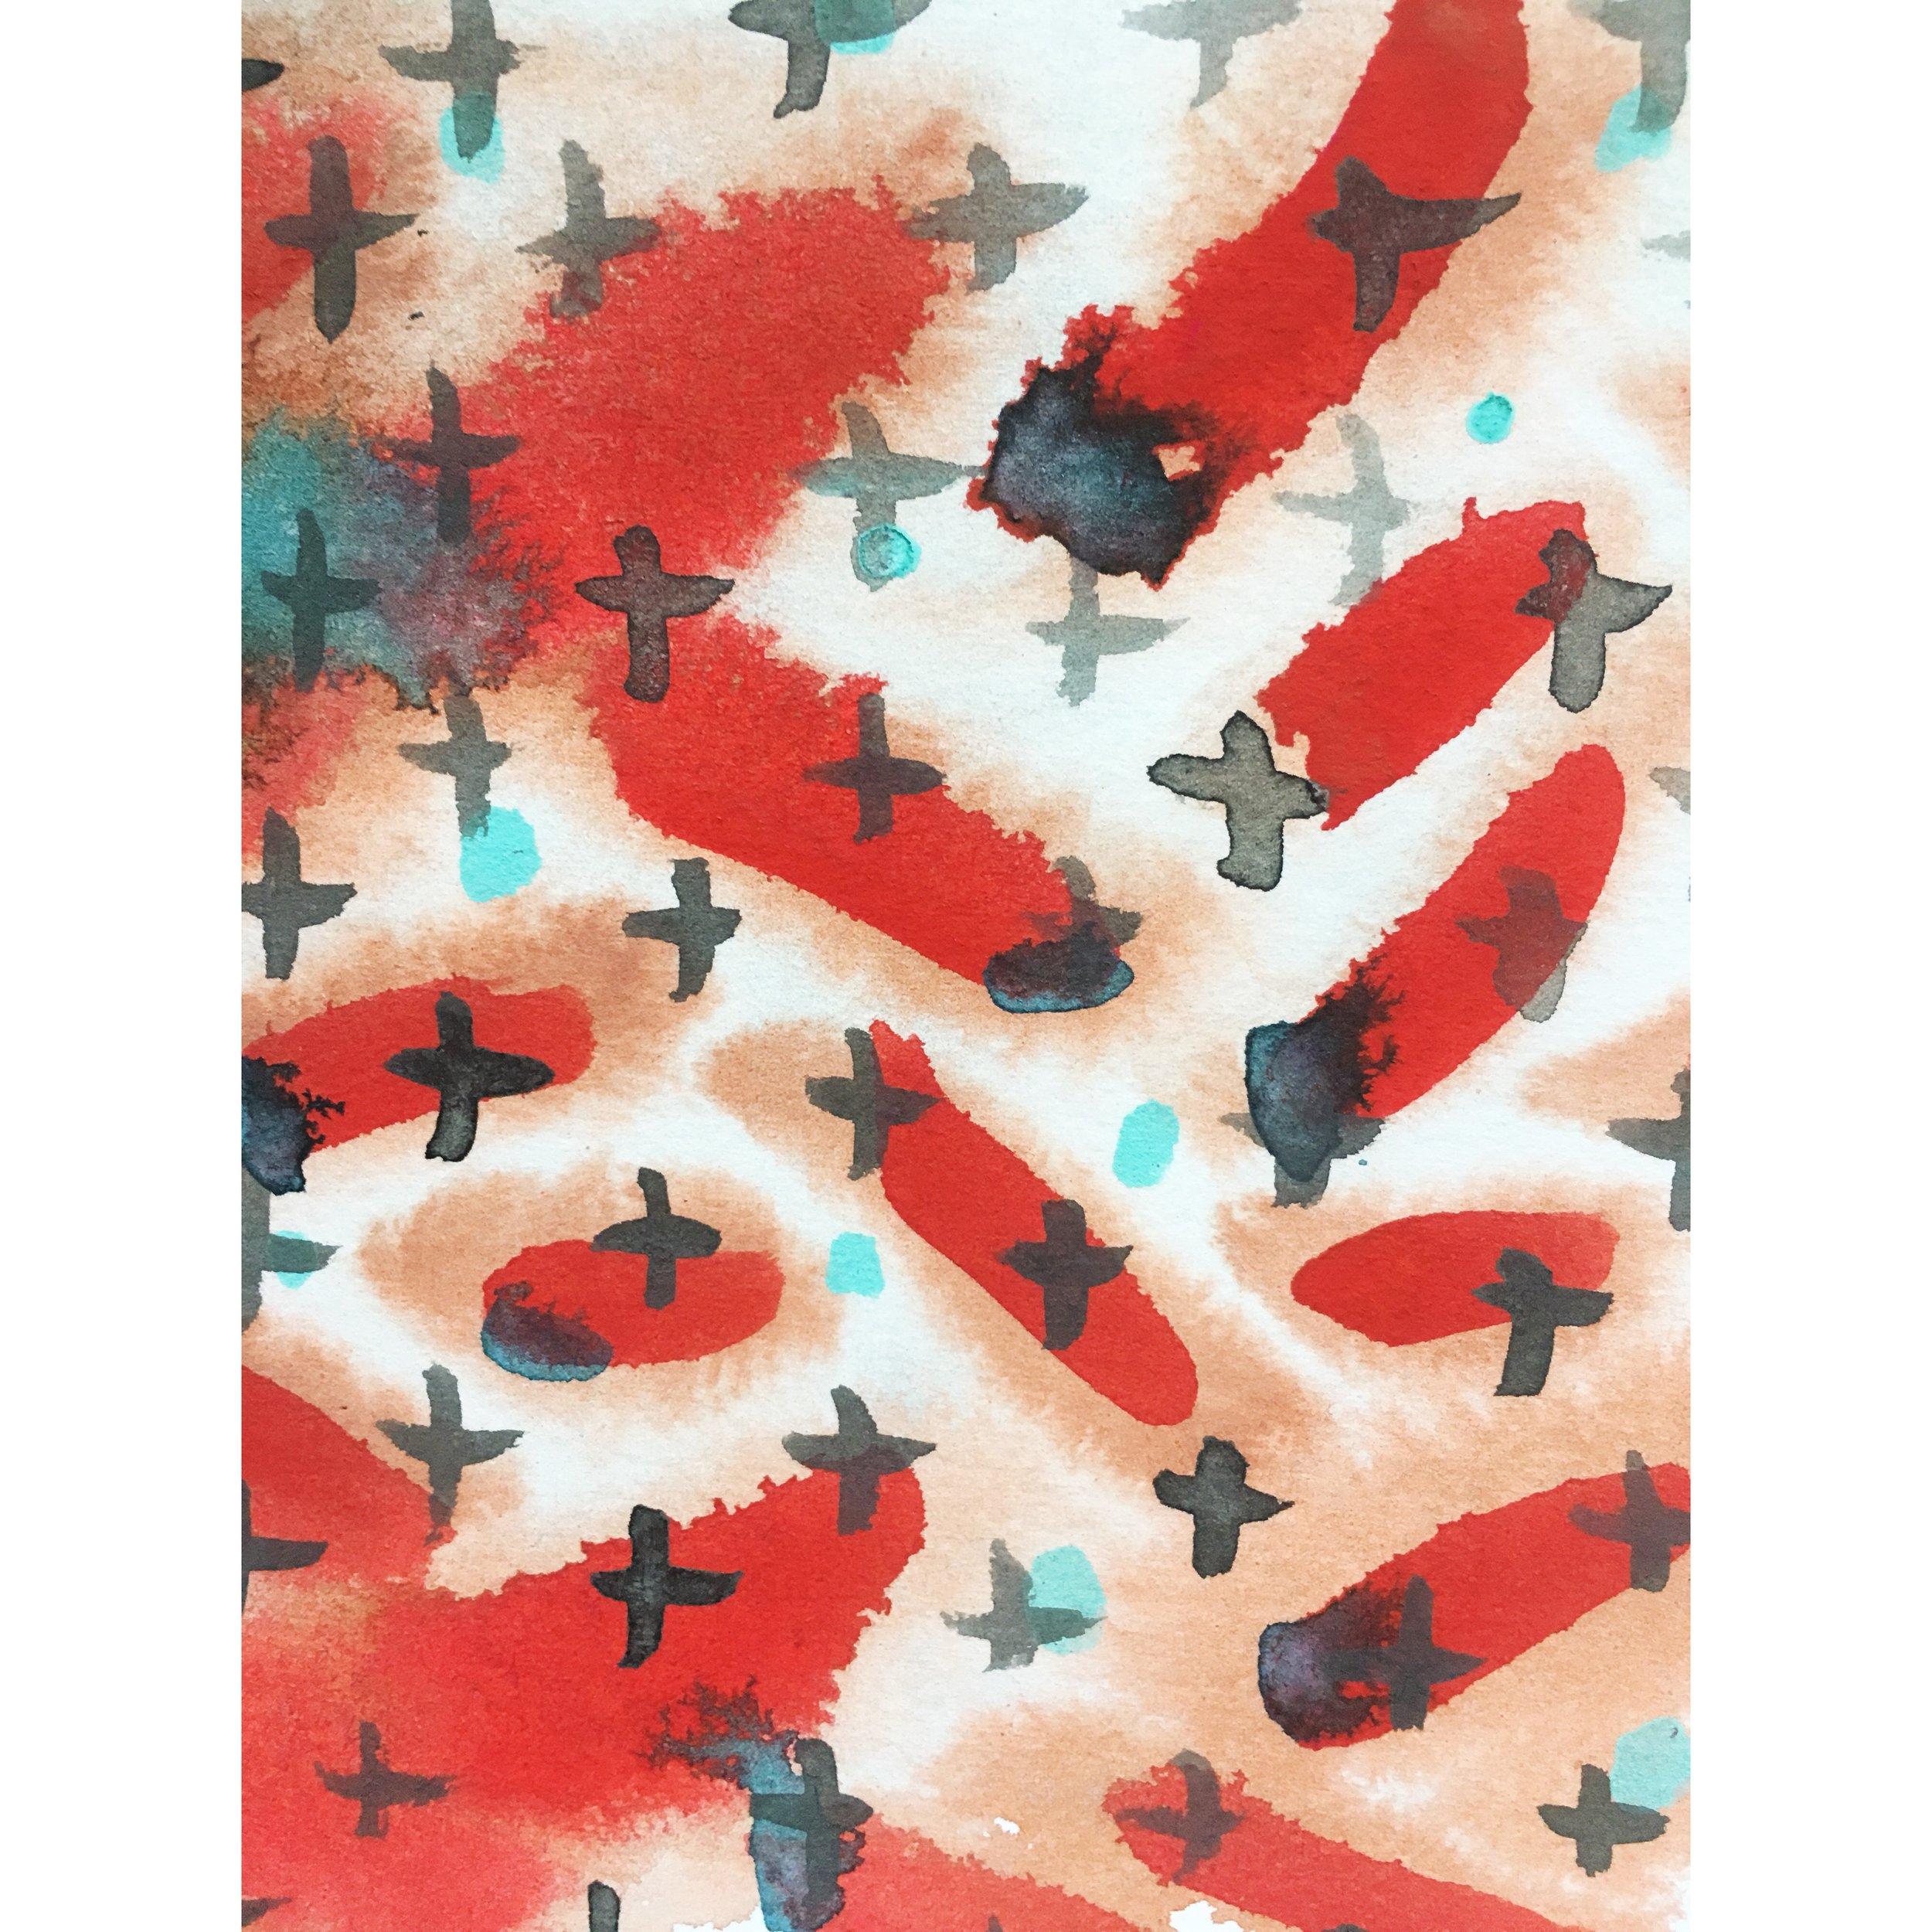 fireworks pattern.JPG